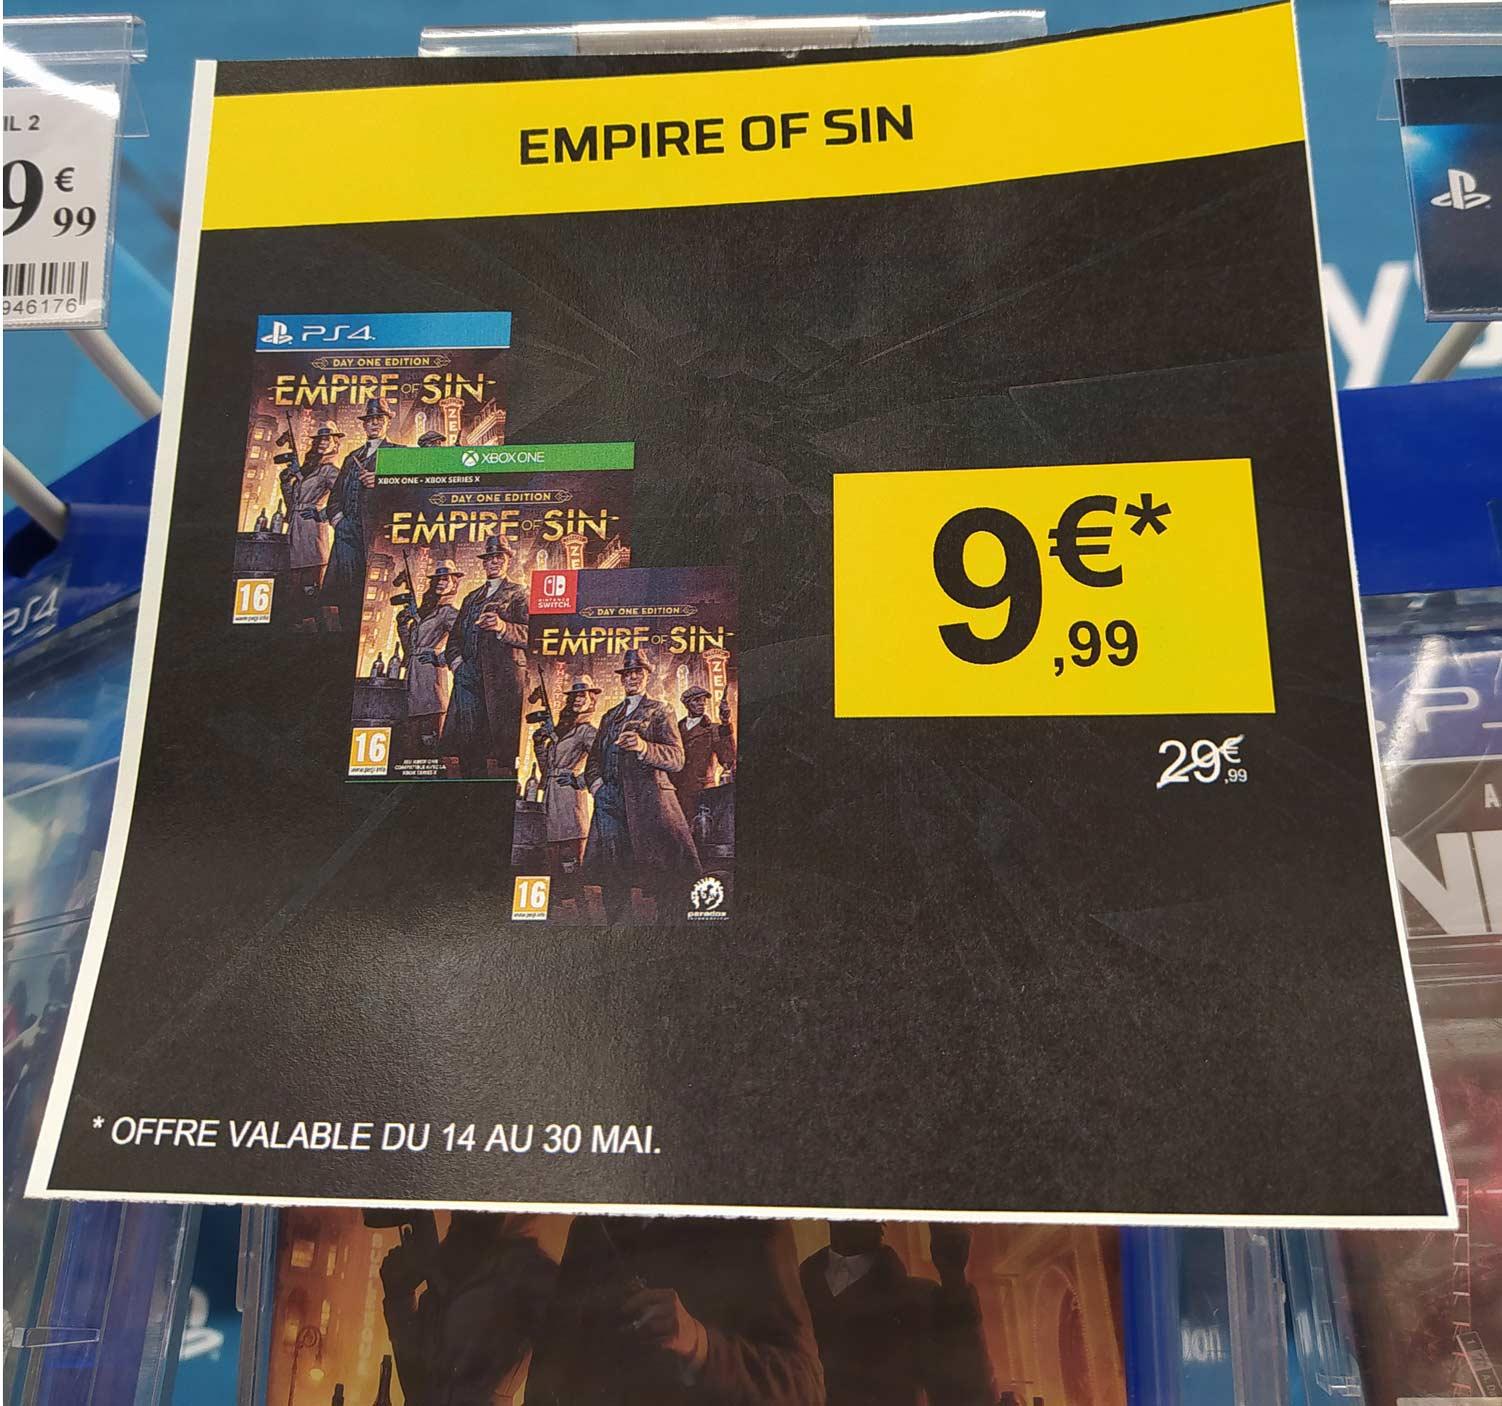 Empire of Sin sur Nintendo Switch, PS4, Xbox - Belfort Bessoncourt (90)